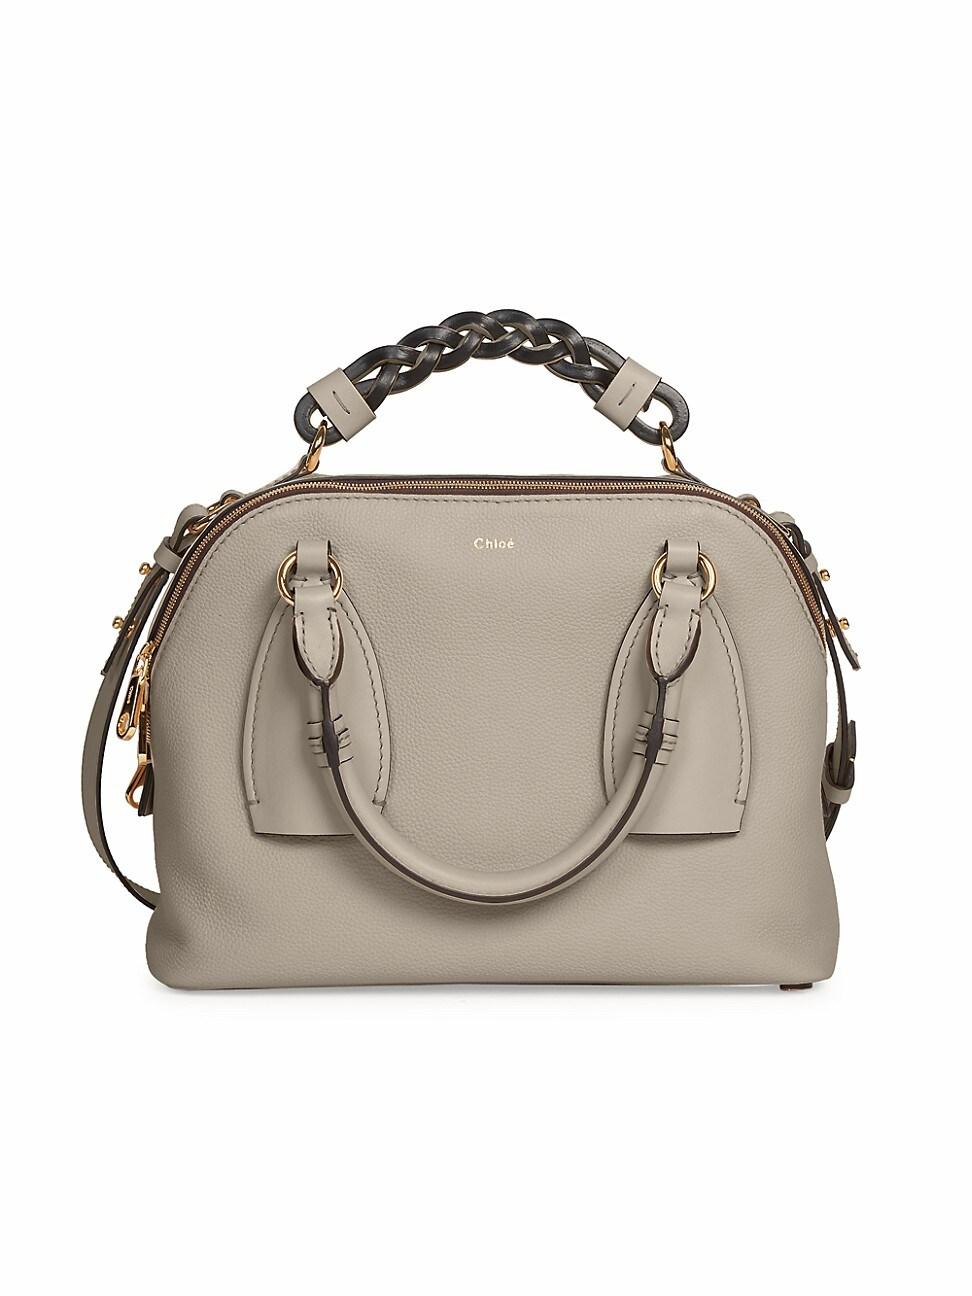 Chloé Women's Small Daria Leather Satchel In Gray